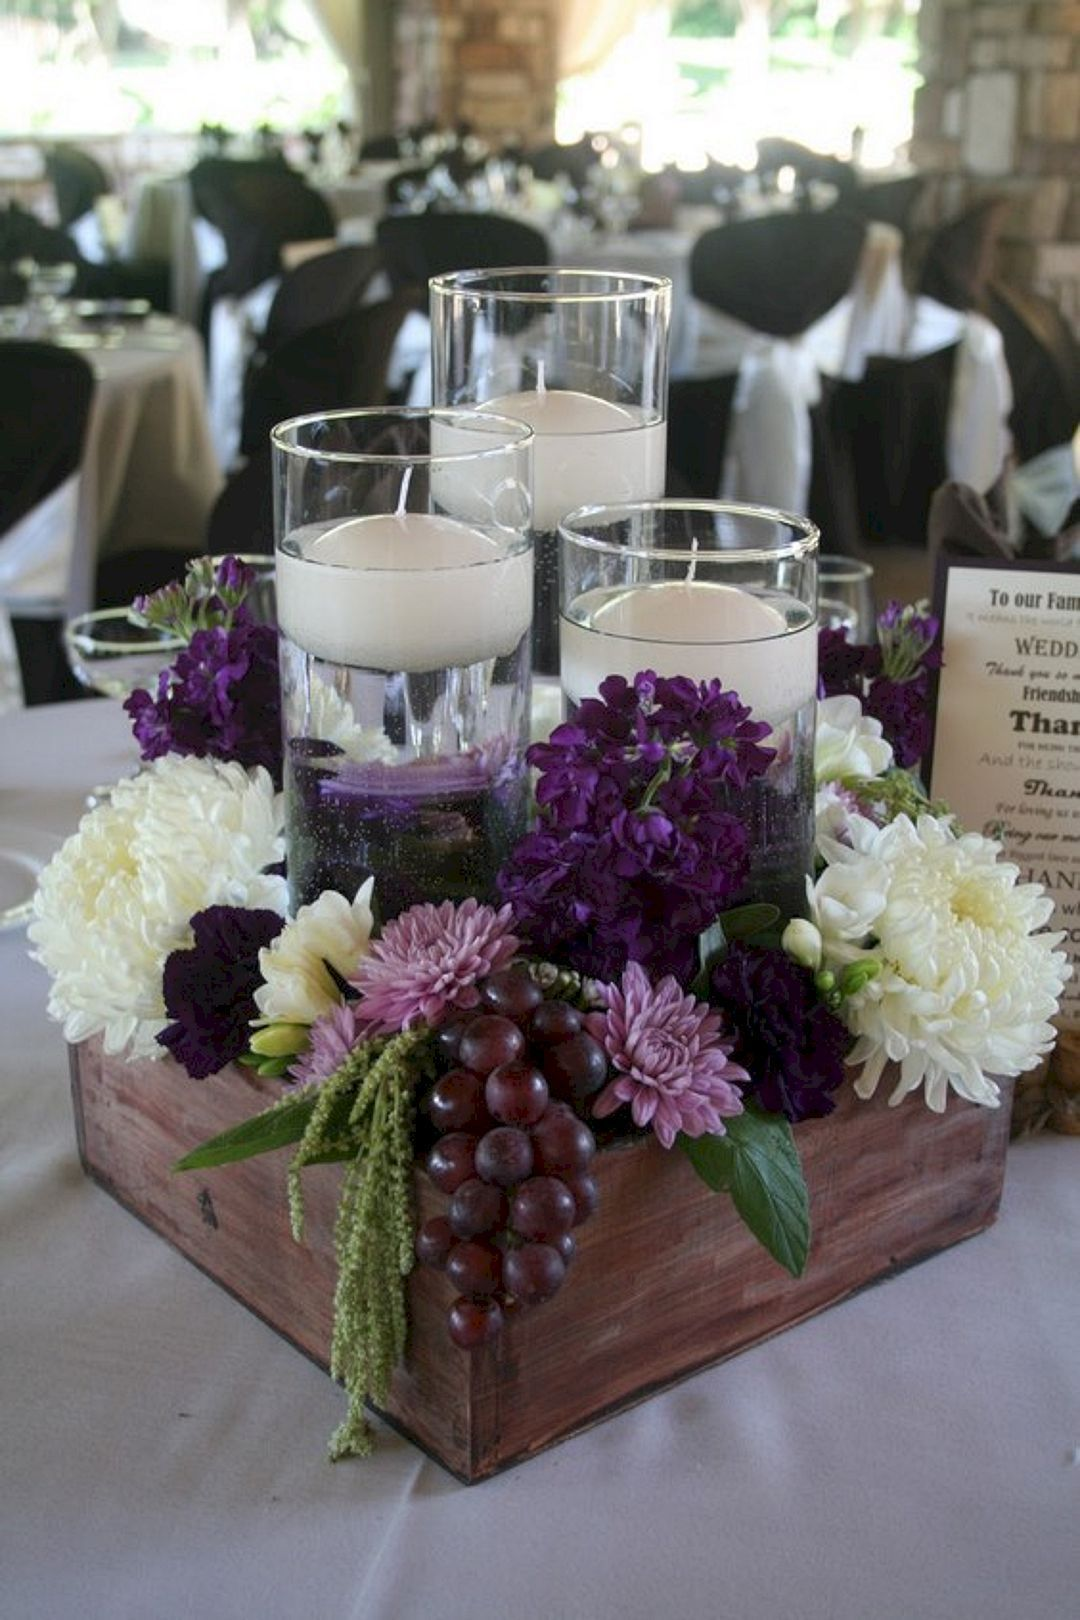 Wedding decoration ideas purple   DIY Creative Rustic Chic Wedding Centerpieces Ideas  abby